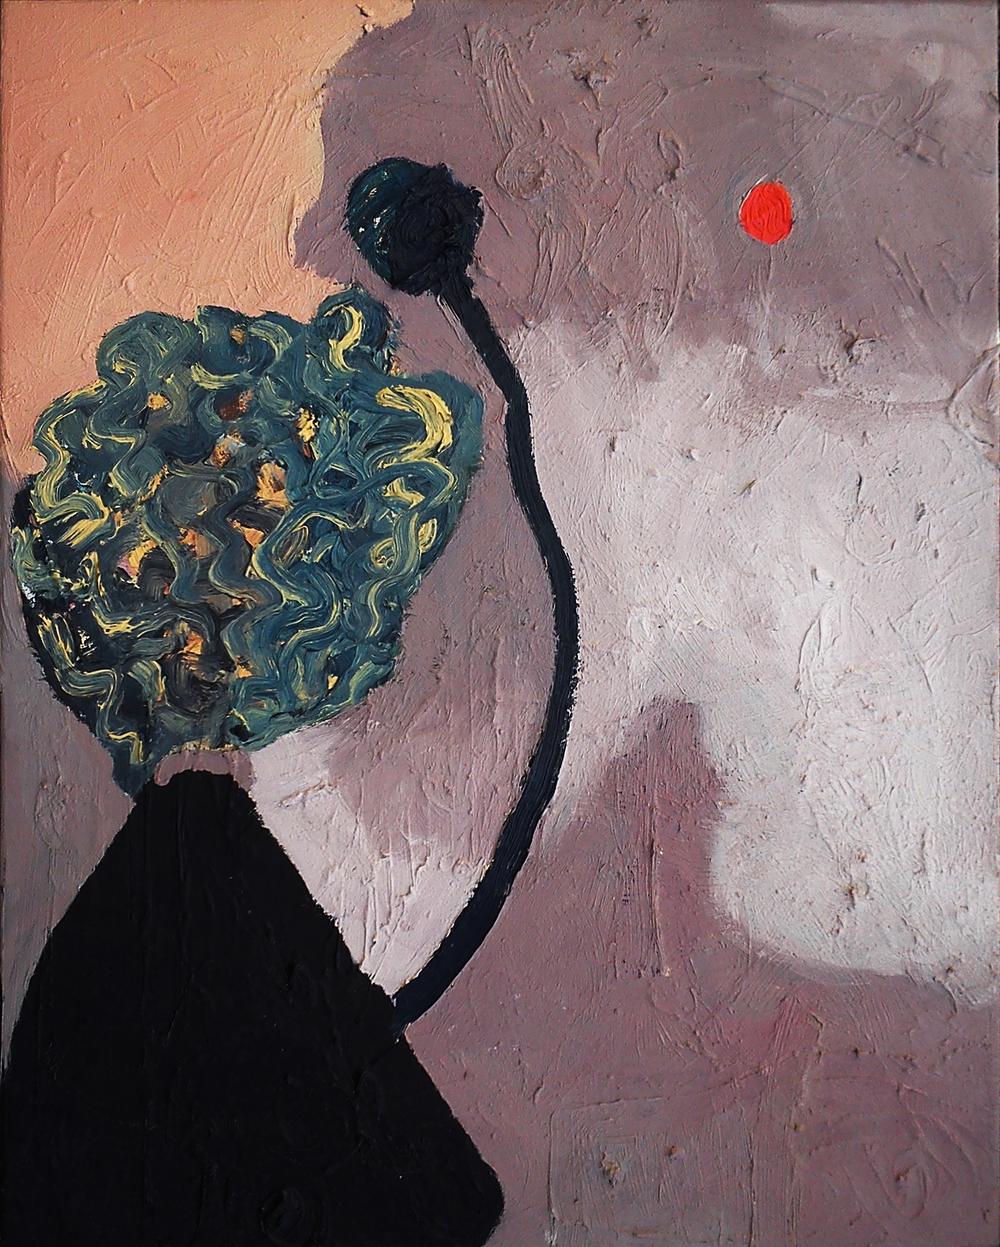 Planet X, oil on canvas, 51 x 41 cm, 2013